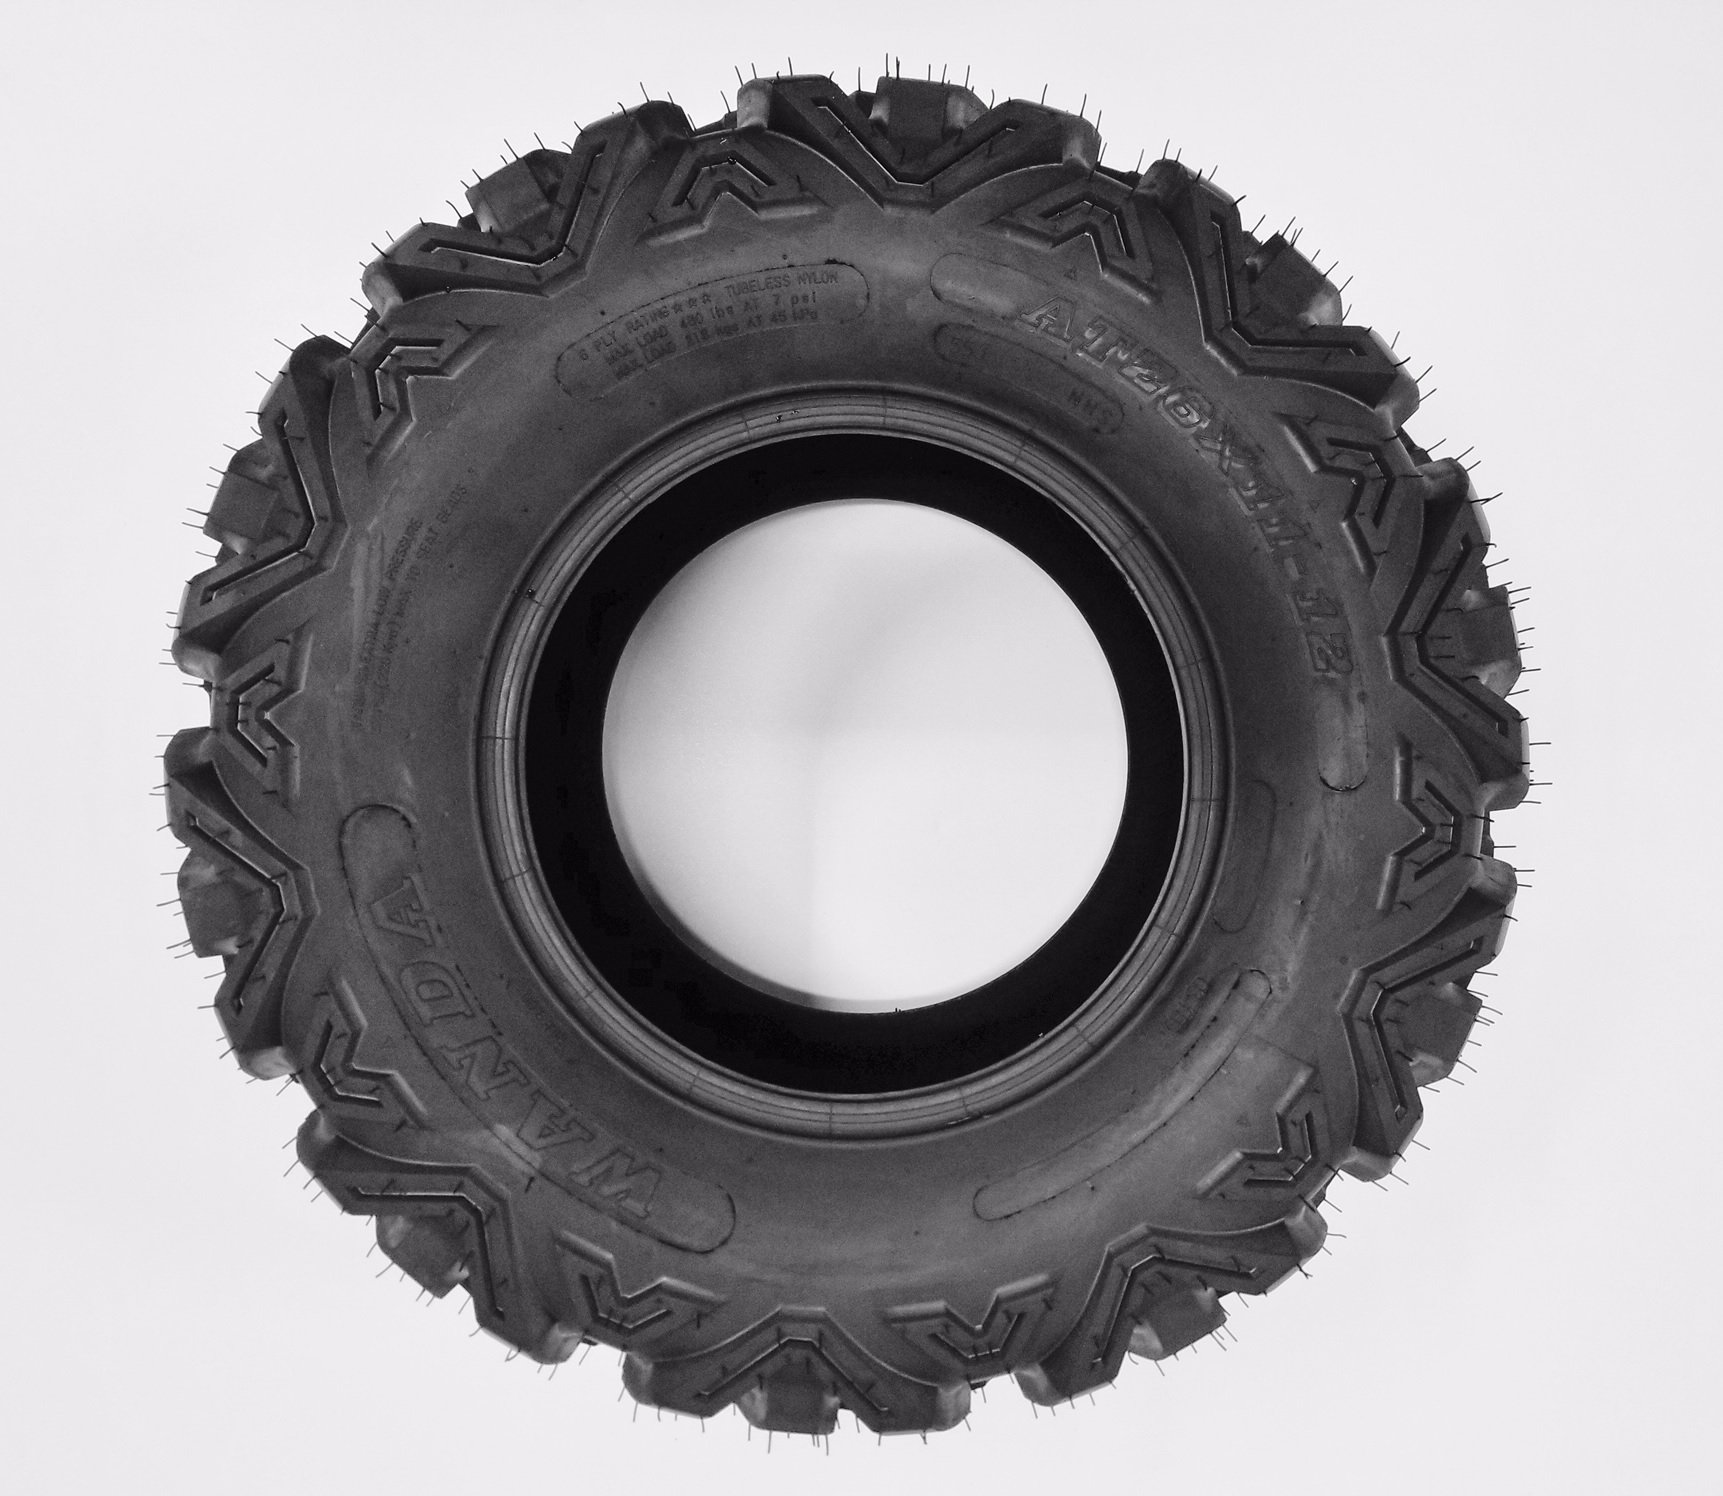 SunF A033 Power.I AT 26x9-14 ATV UTV Tire, All-Terrain Off-Road, 6 PR, Tubeless